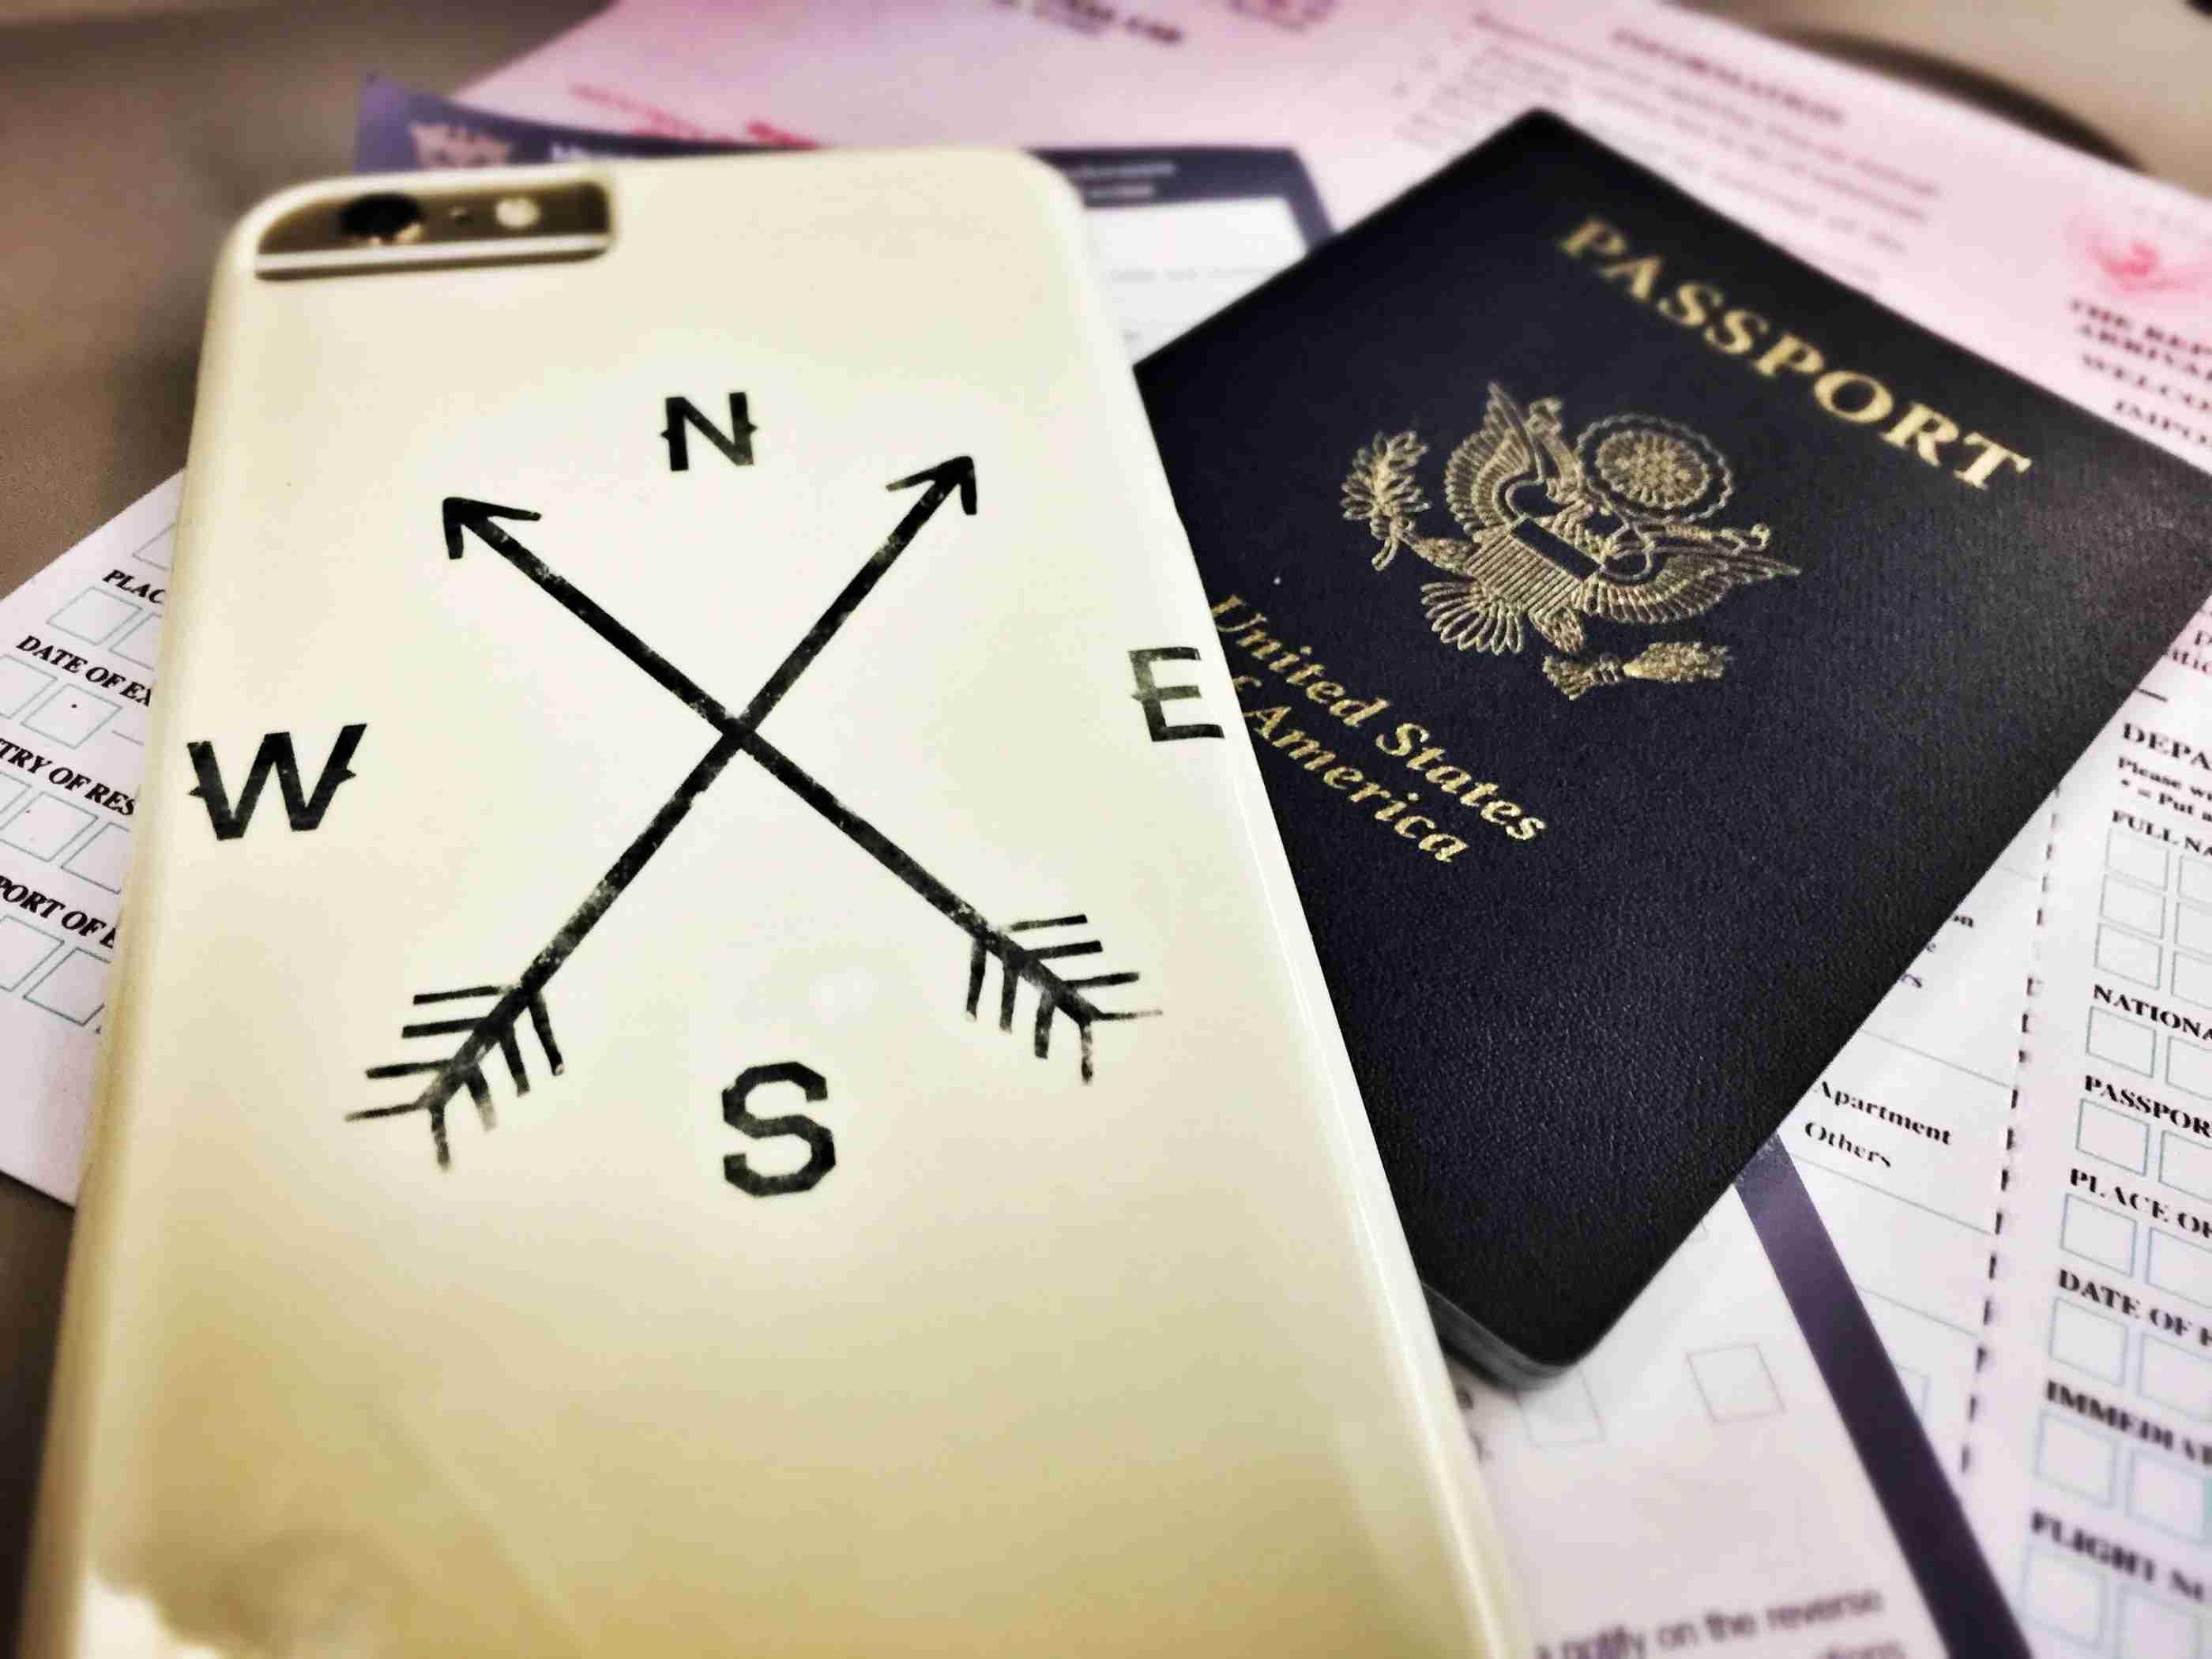 apple-iphone-camera-cameraphone-passport-navigation